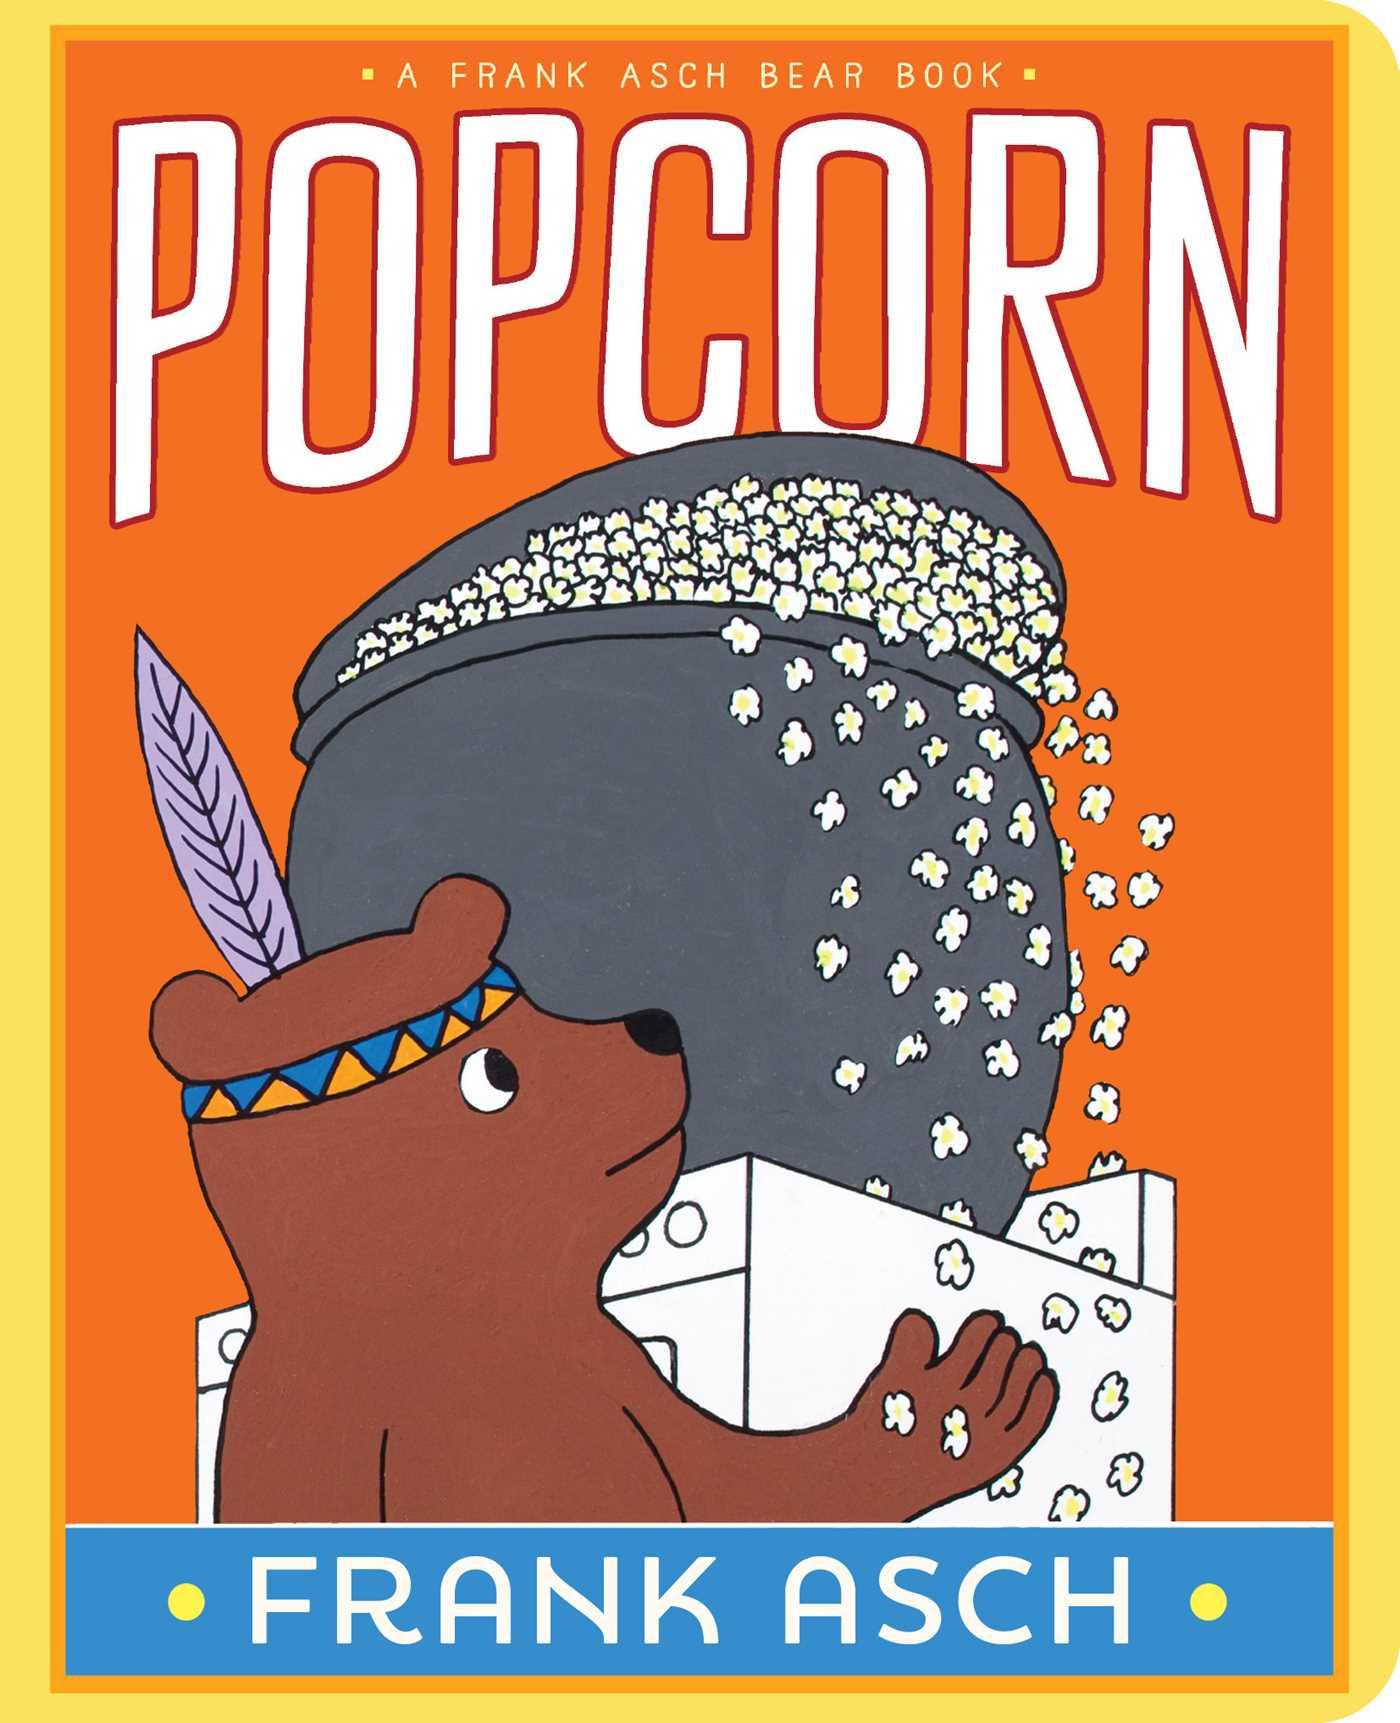 Popcorn 9781481499583 hr